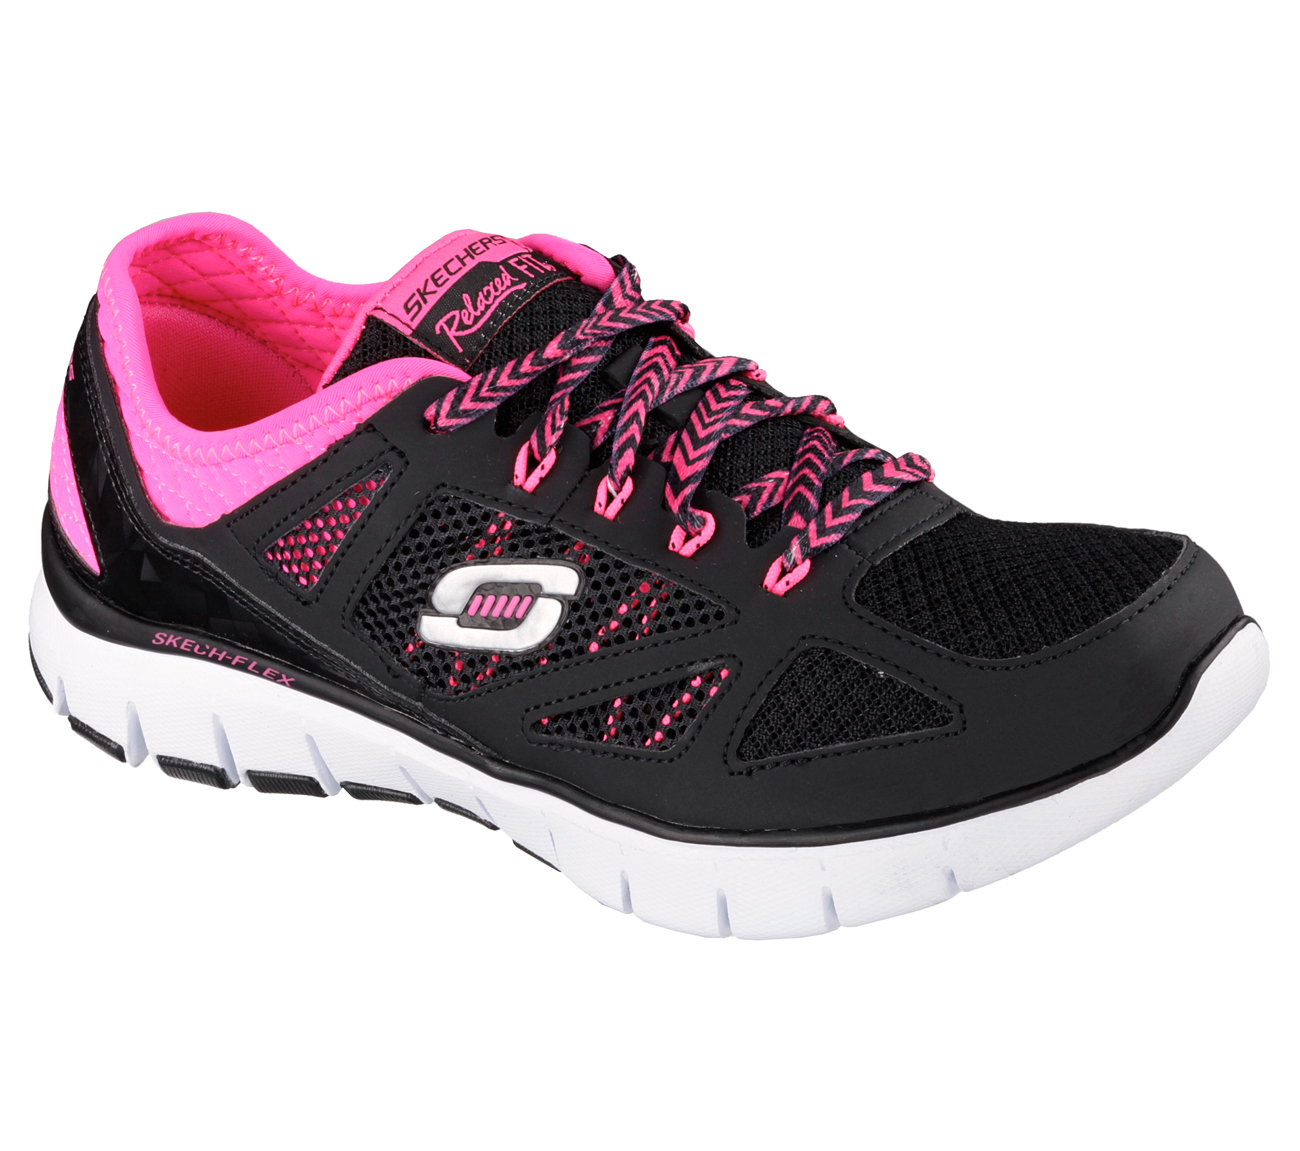 Women's Sneakers - Overstock Shopping - Trendy, Designer Shoes